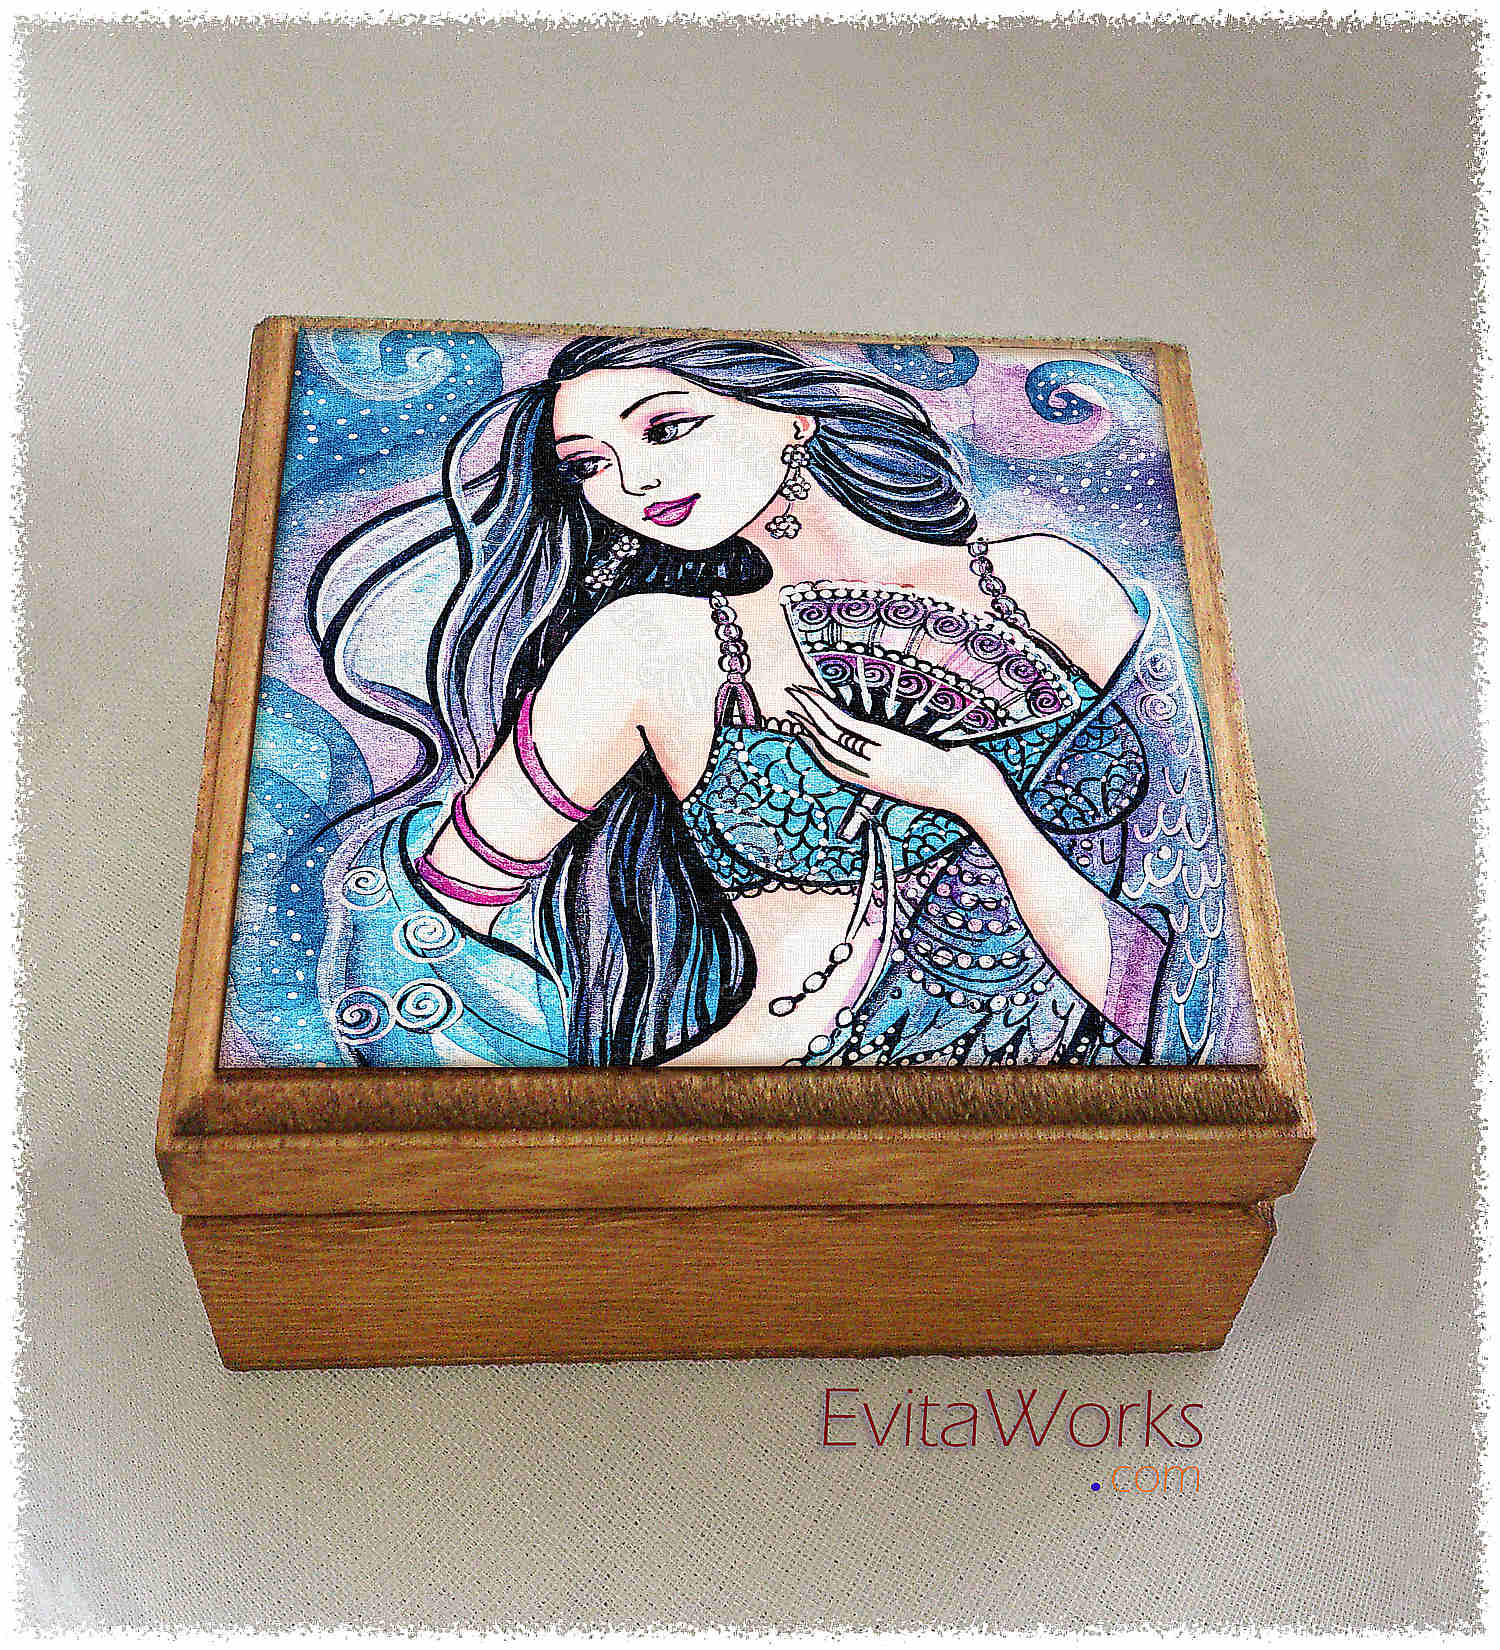 Mermaid 26 Boxsq ~ EvitaWorks